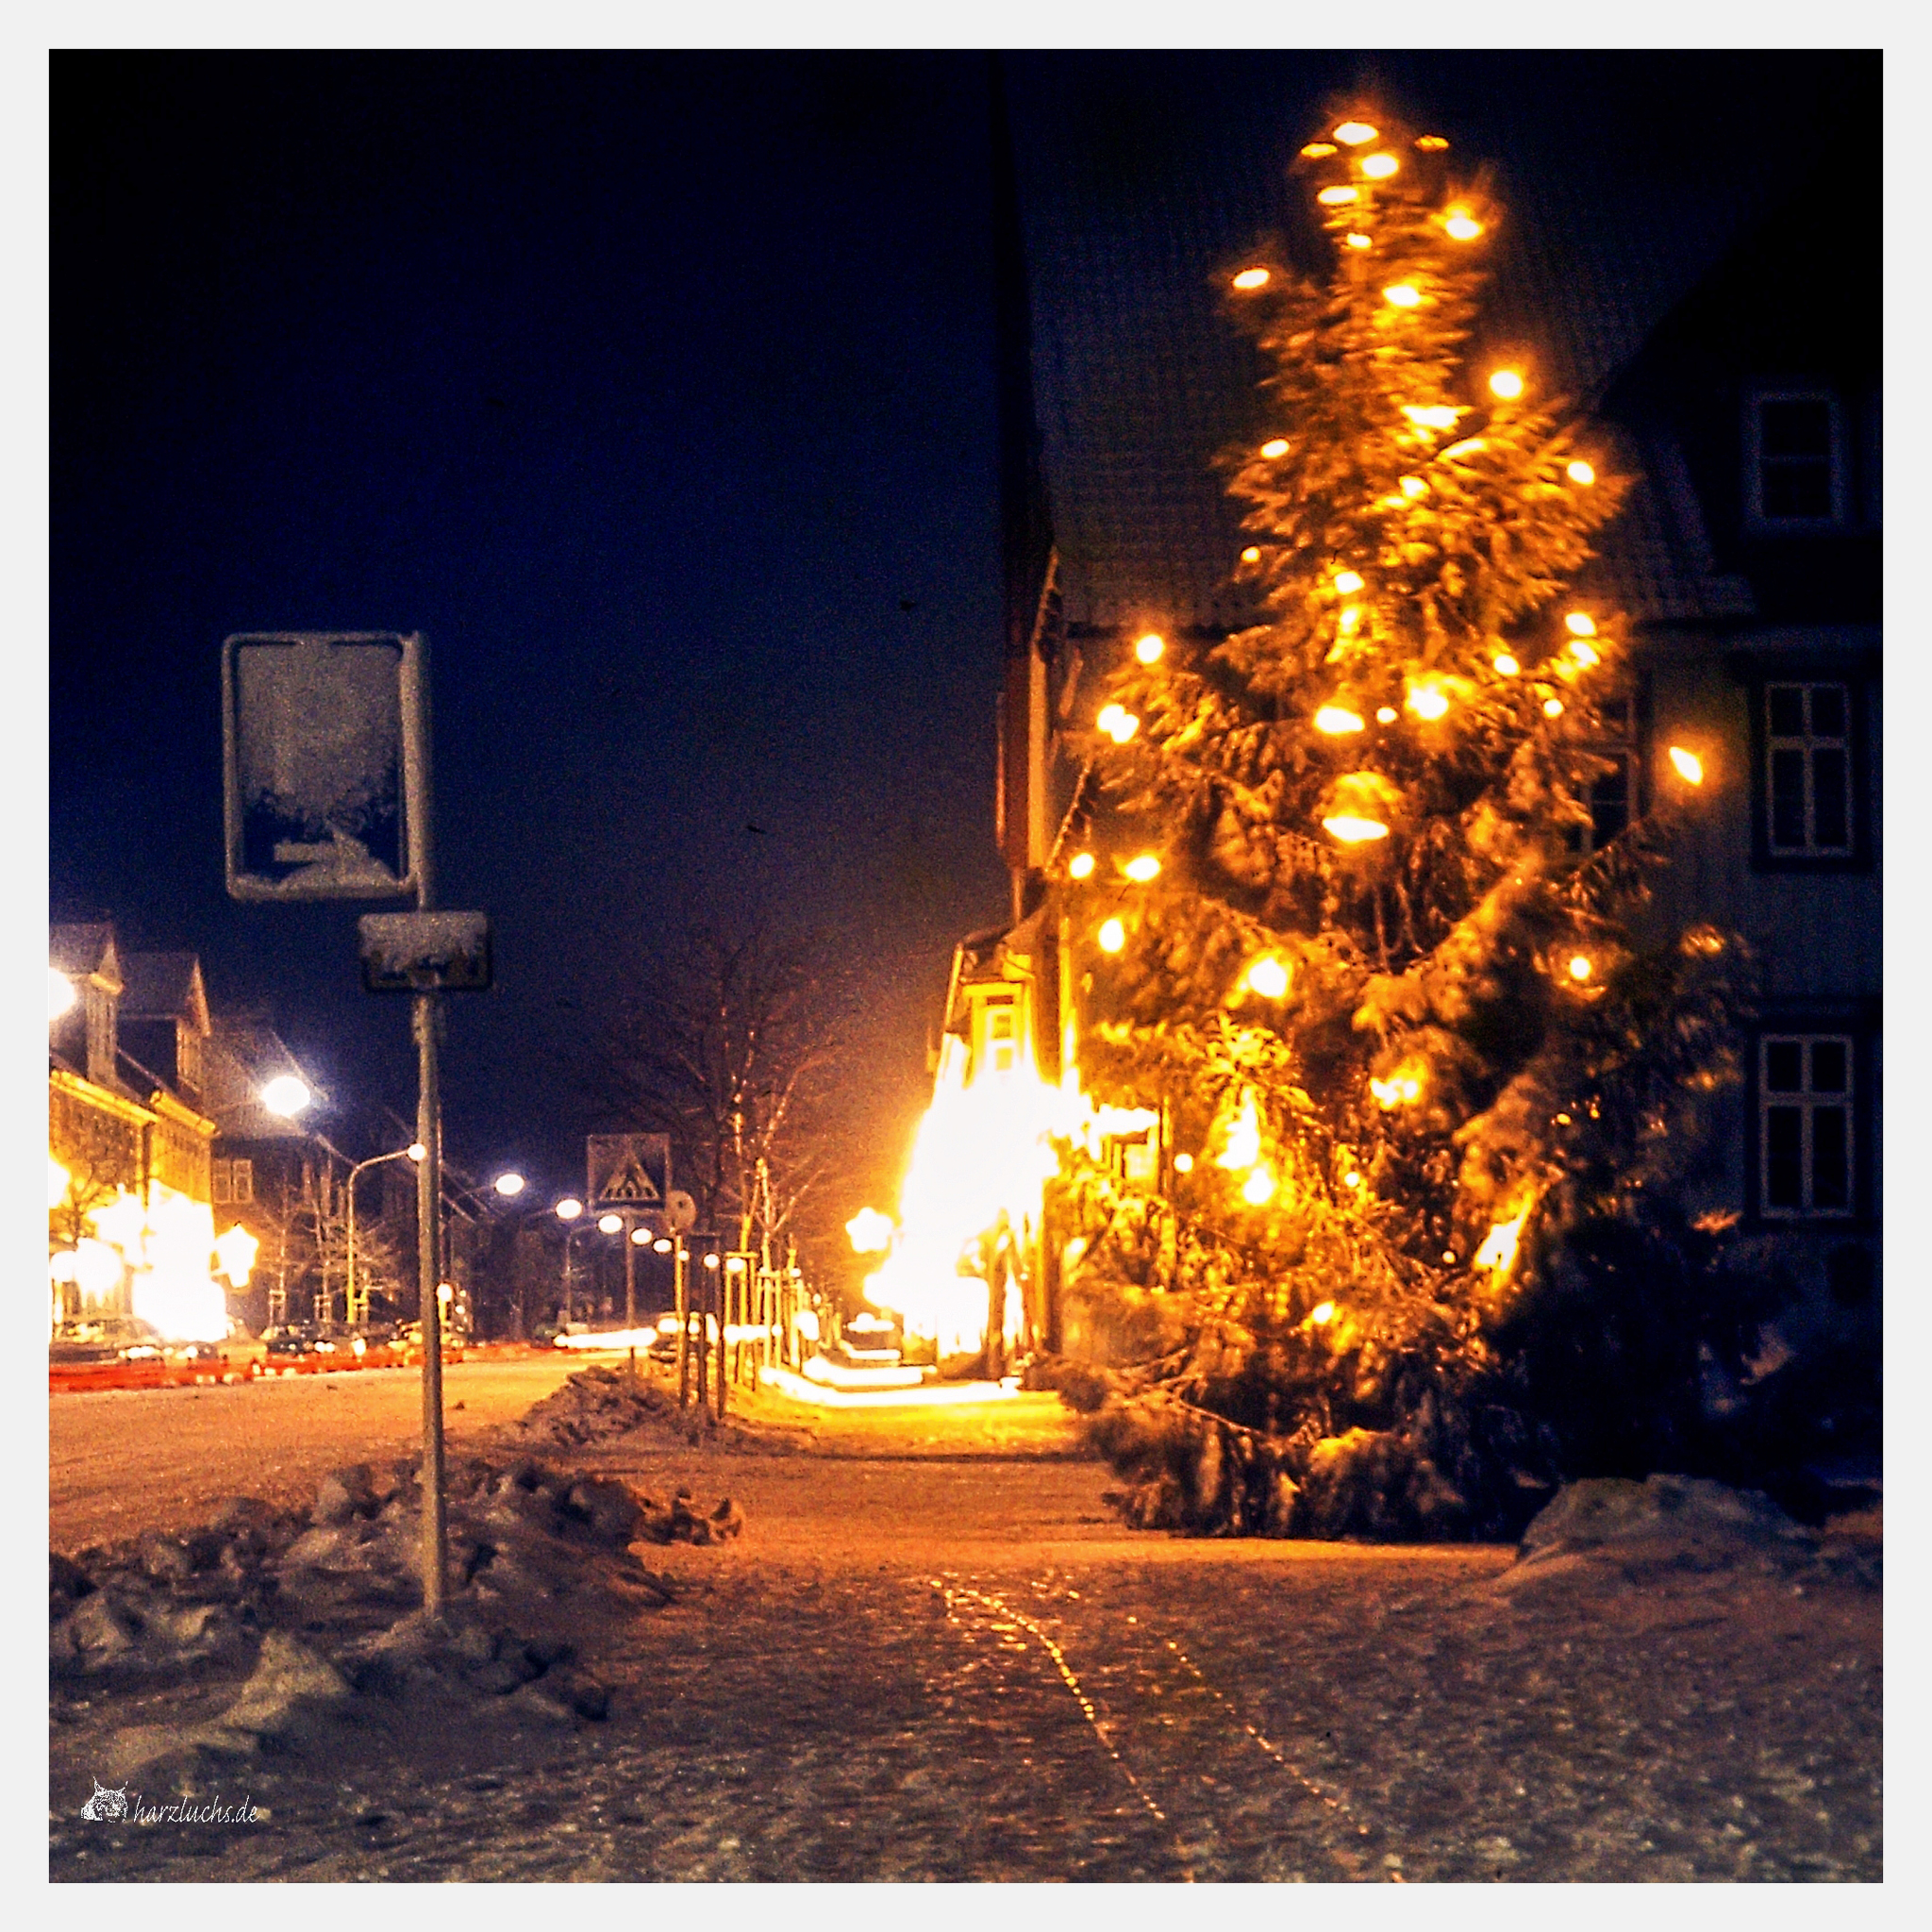 ca. 1968 - die Goslarsche Straße in Zellerfeld